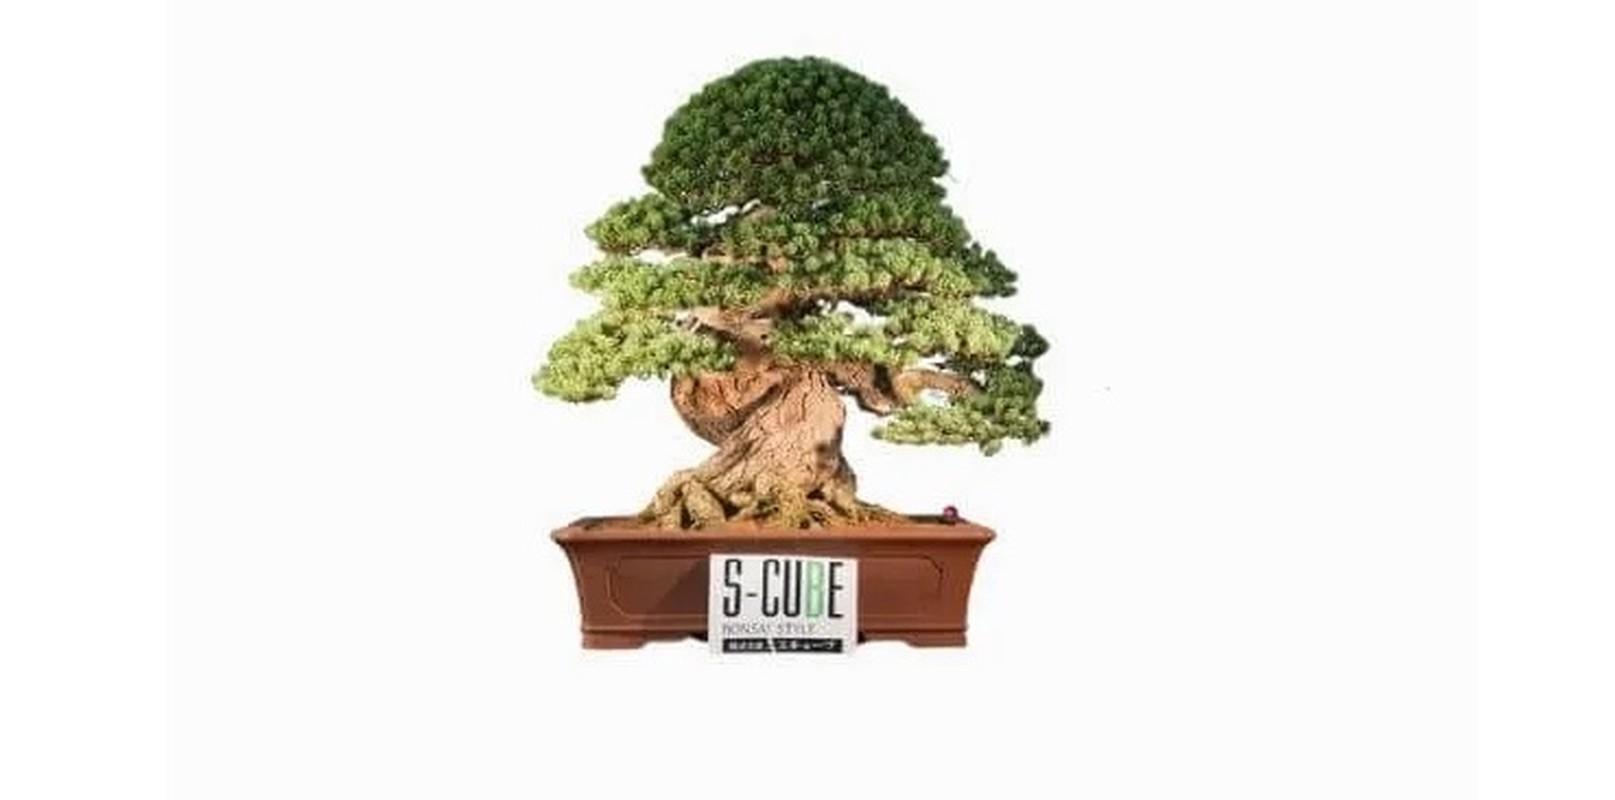 Man nhan loat sieu pham bonsai nha giau co tien cung kho mua-Hinh-2